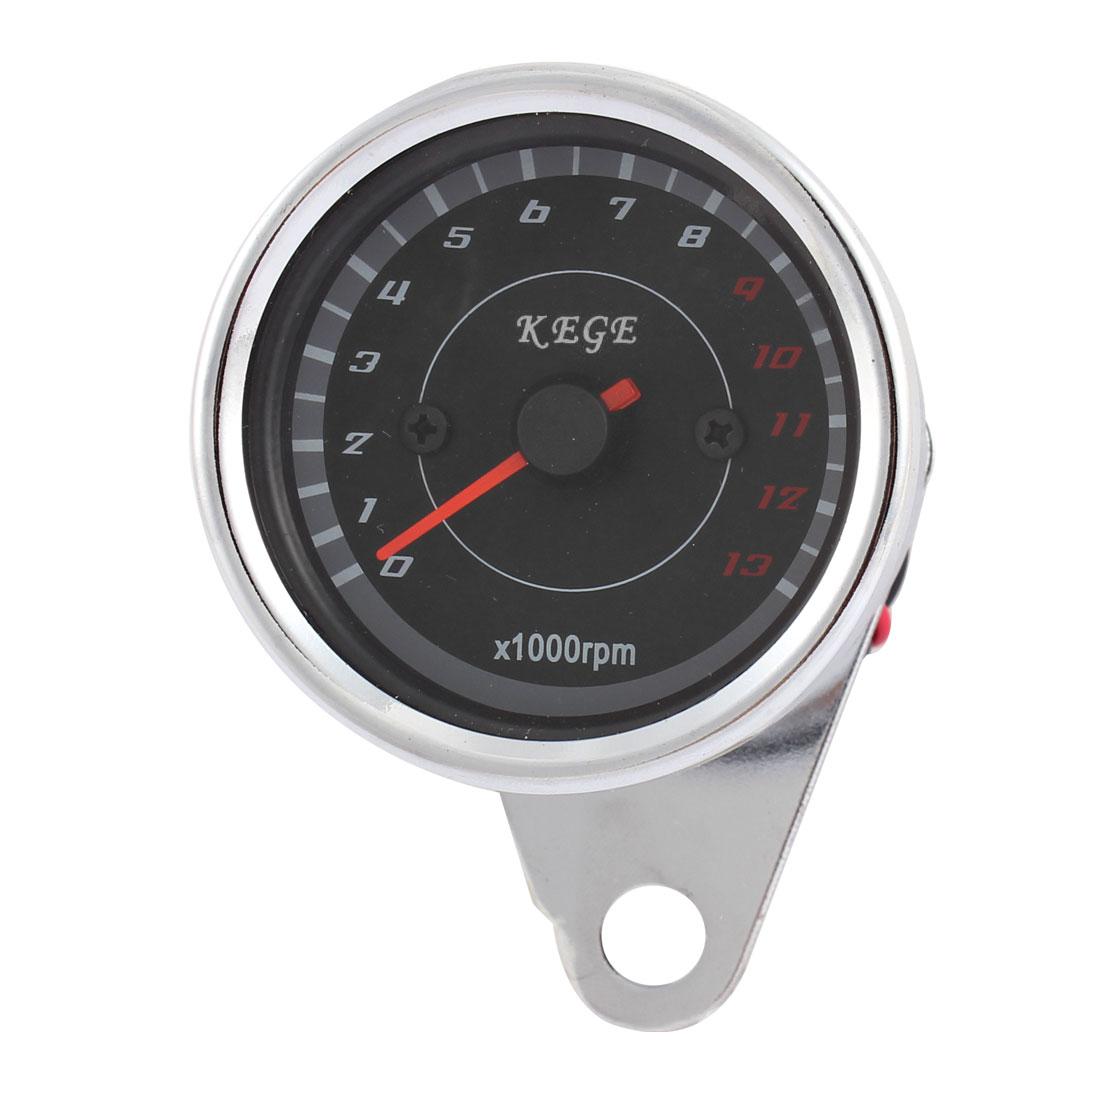 Motorbike Universal Waterproof Tachometer Speedometer Tacho Gauge 0-13000RPM